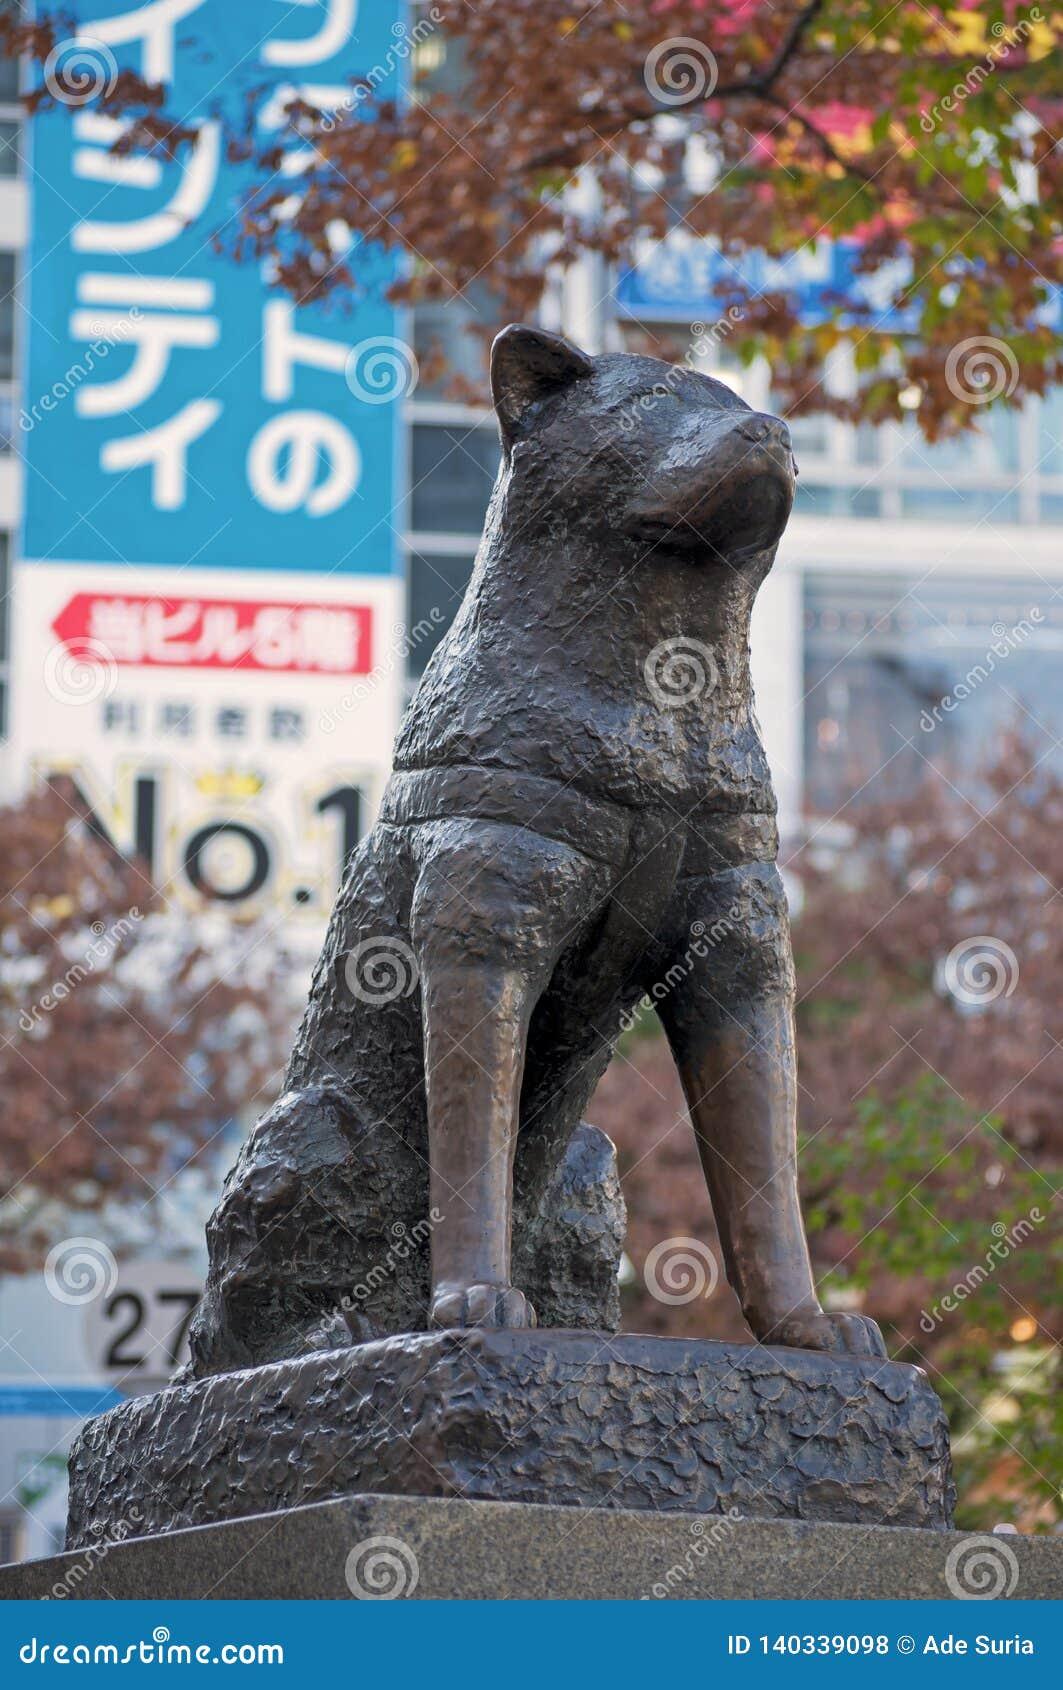 Hachikostandbeeld in Shibuya, Japan